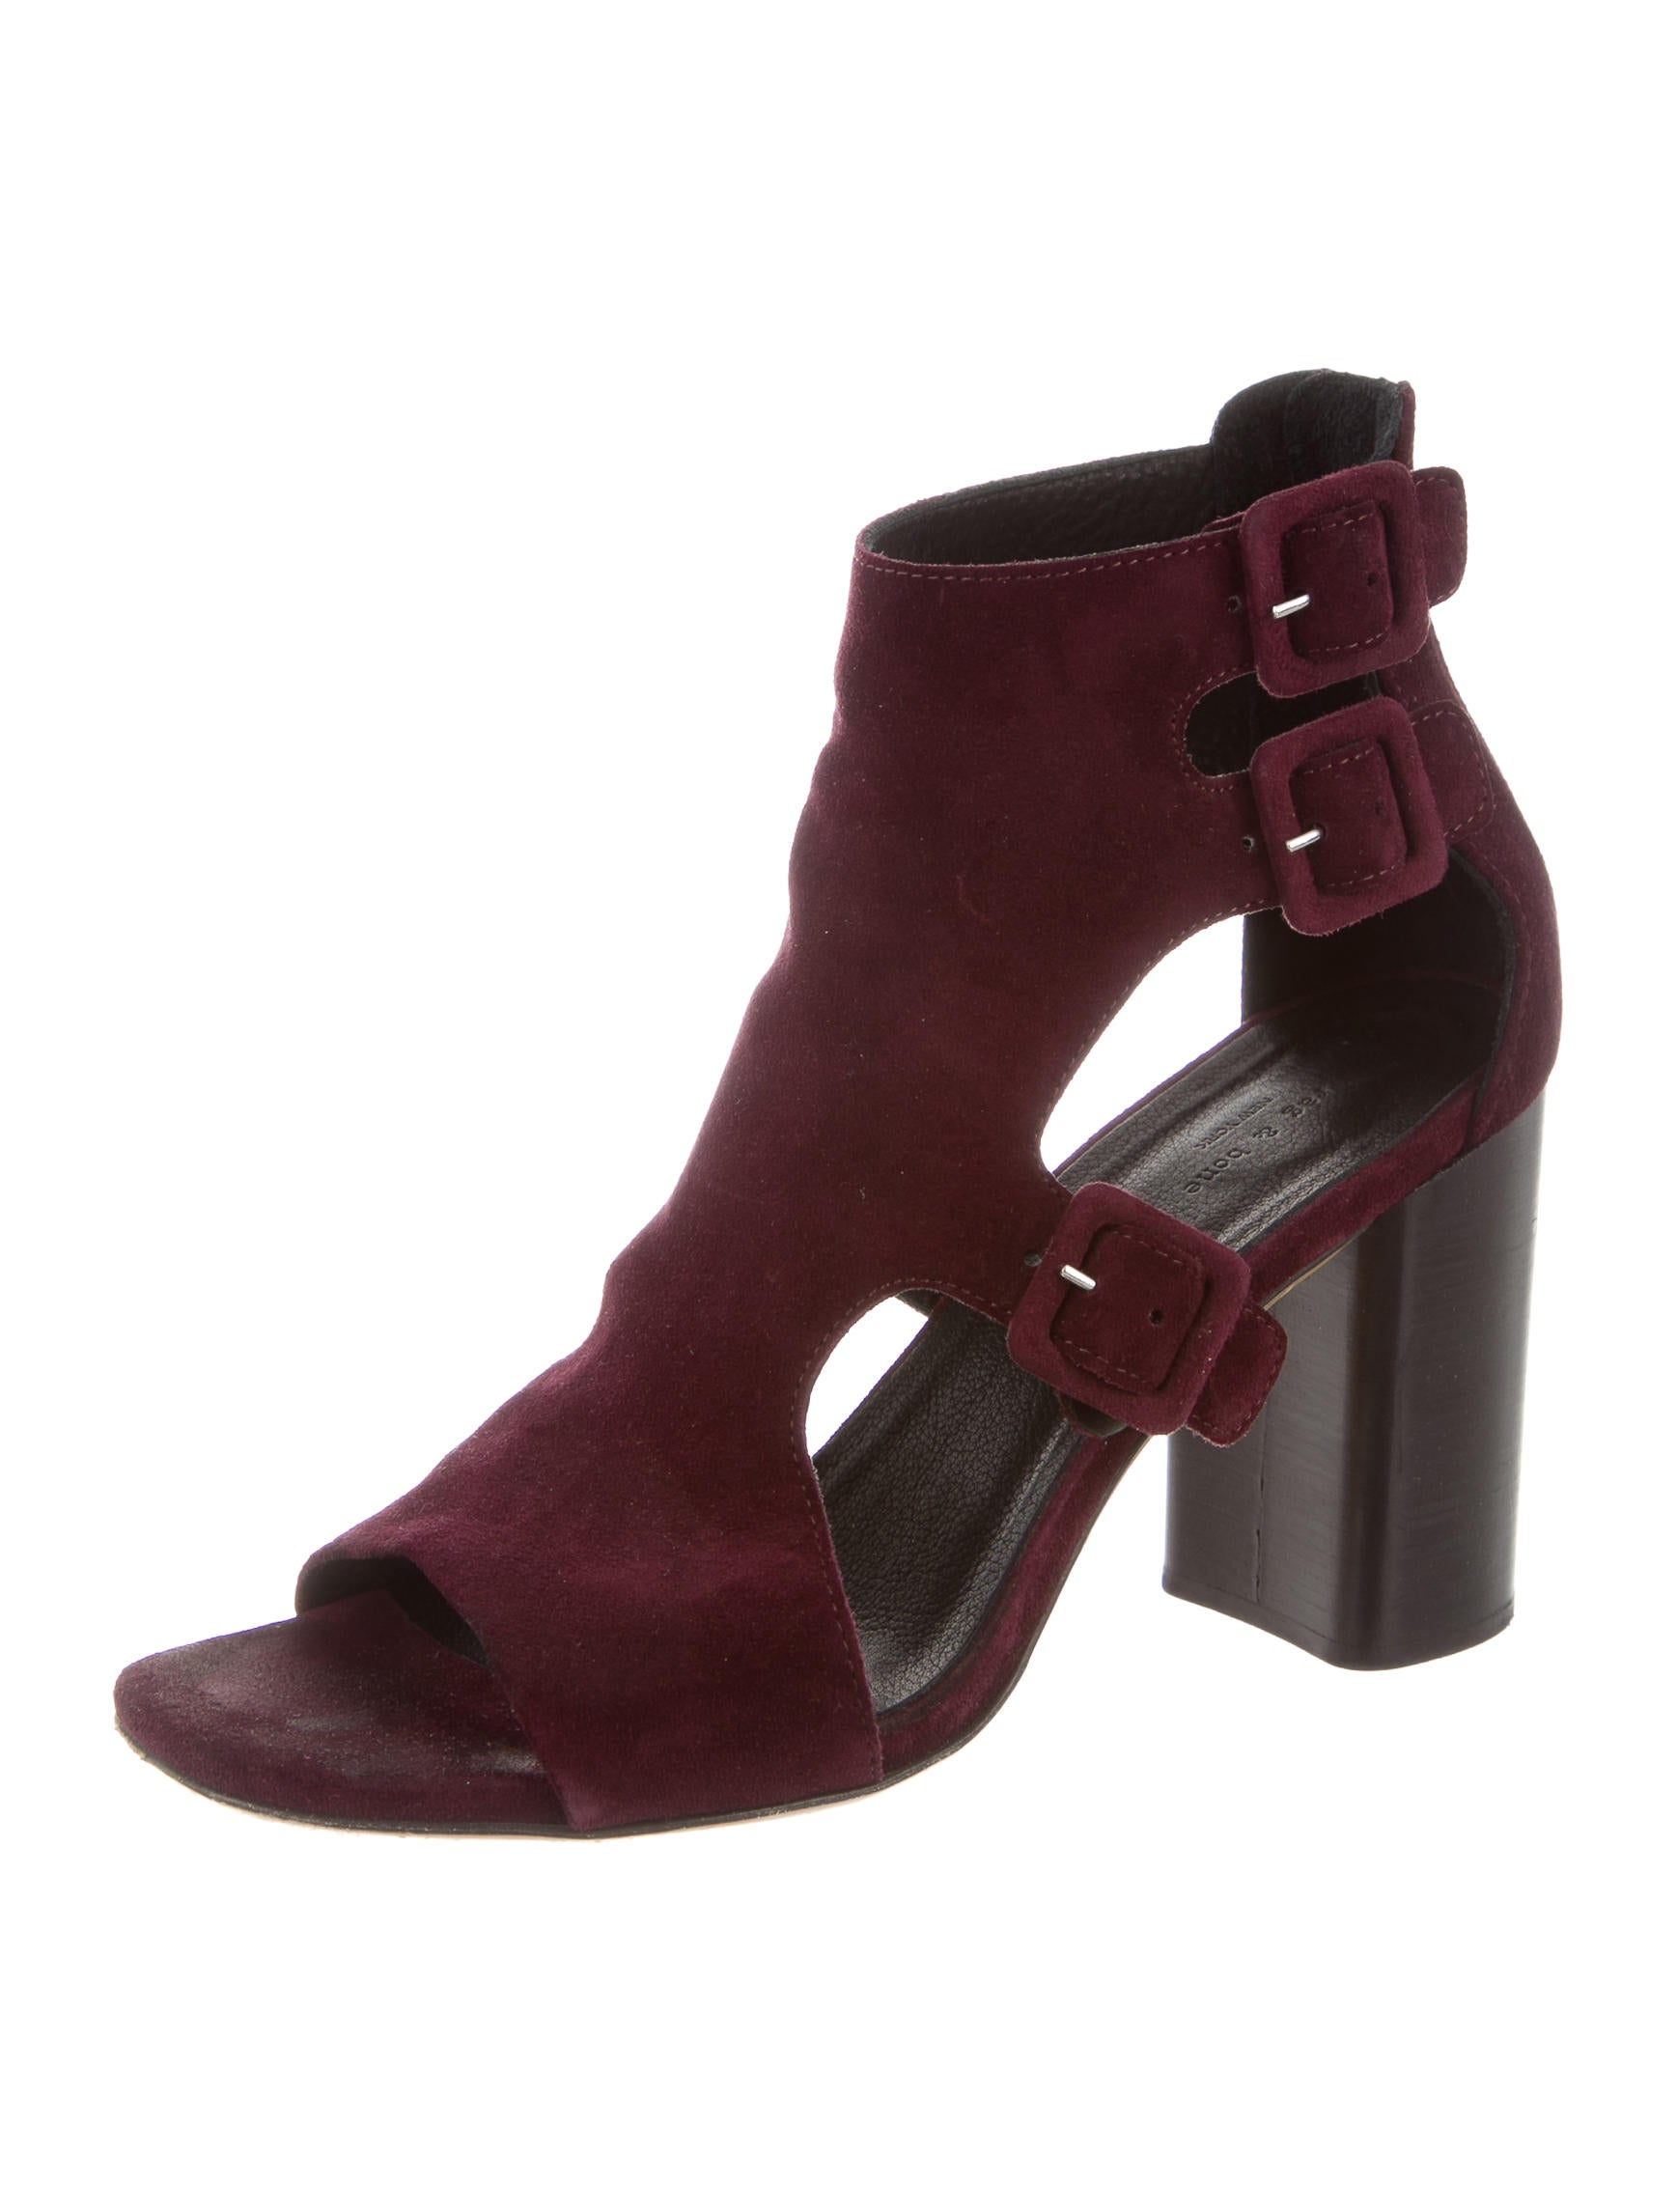 cheap sale fast delivery sale in China Rag & Bone Genoa Cage Sandals i9fILmq8